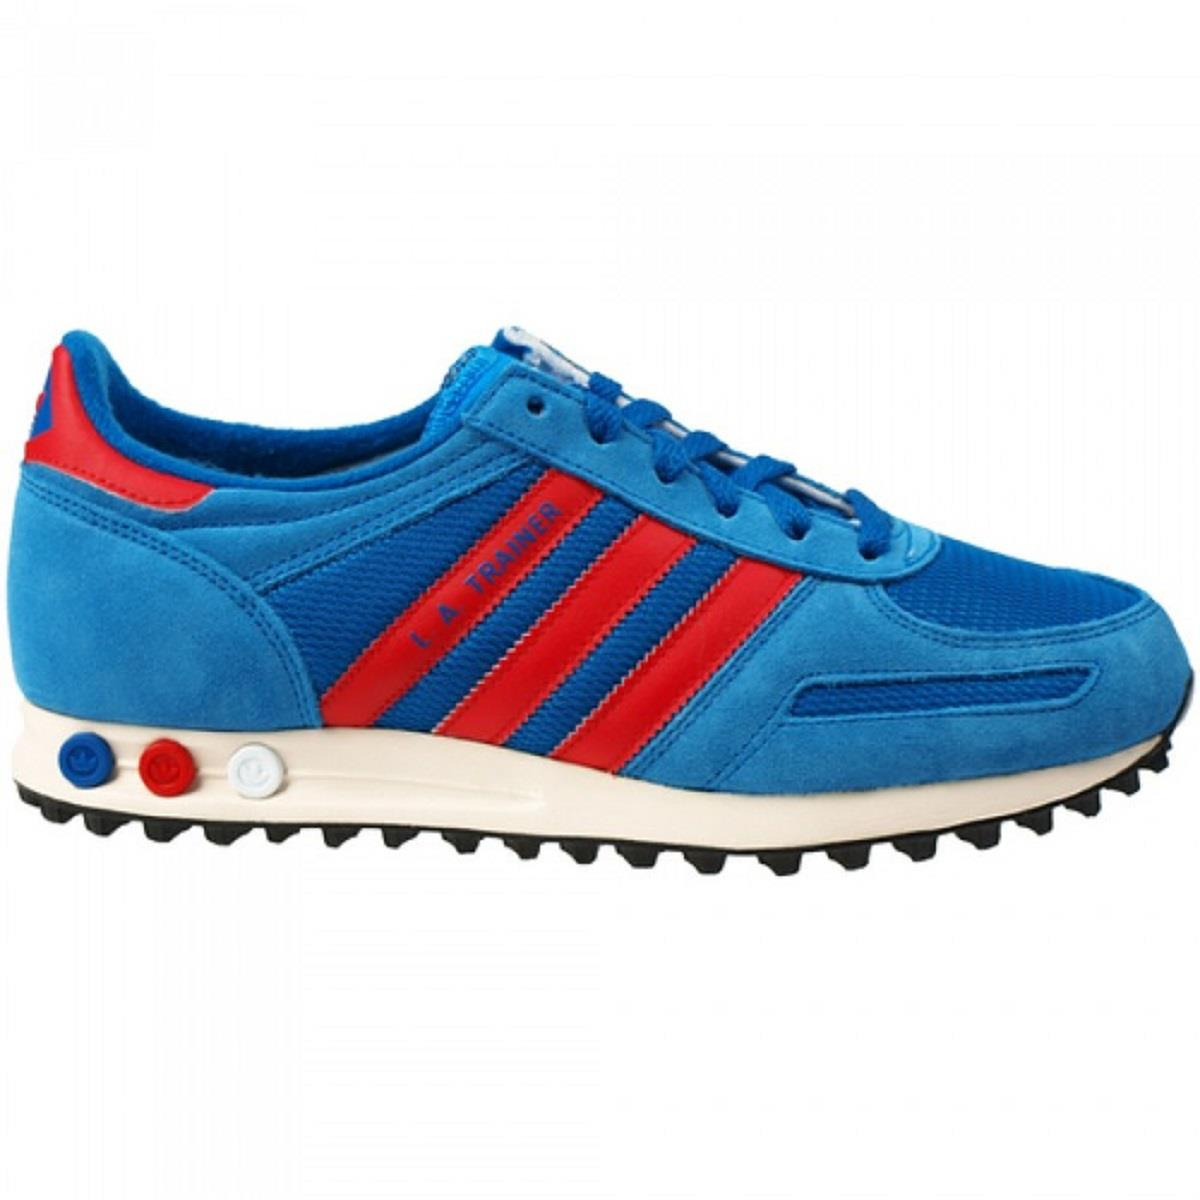 adidas trainer blu e rosse